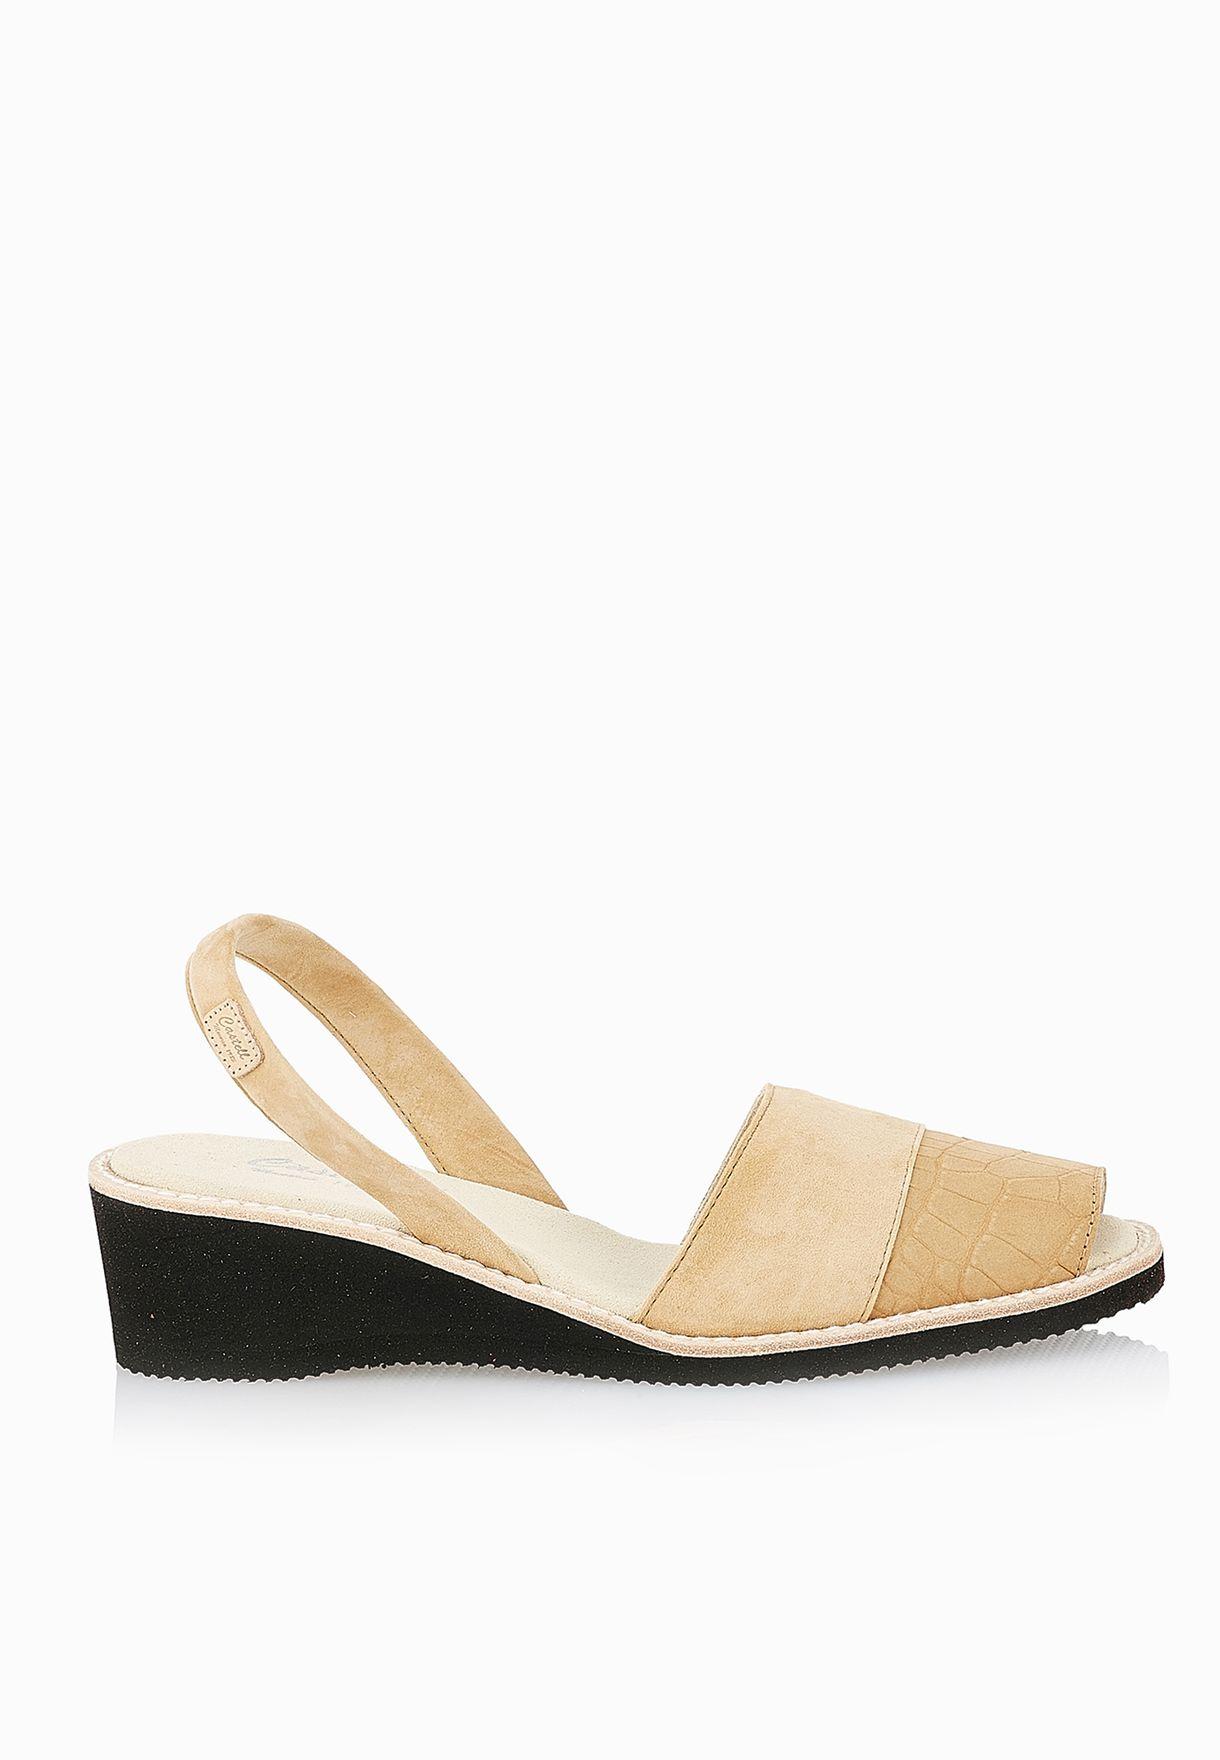 c945b51718f83 Shop Castell prints Kia Sling Back Sandals for Women in UAE ...